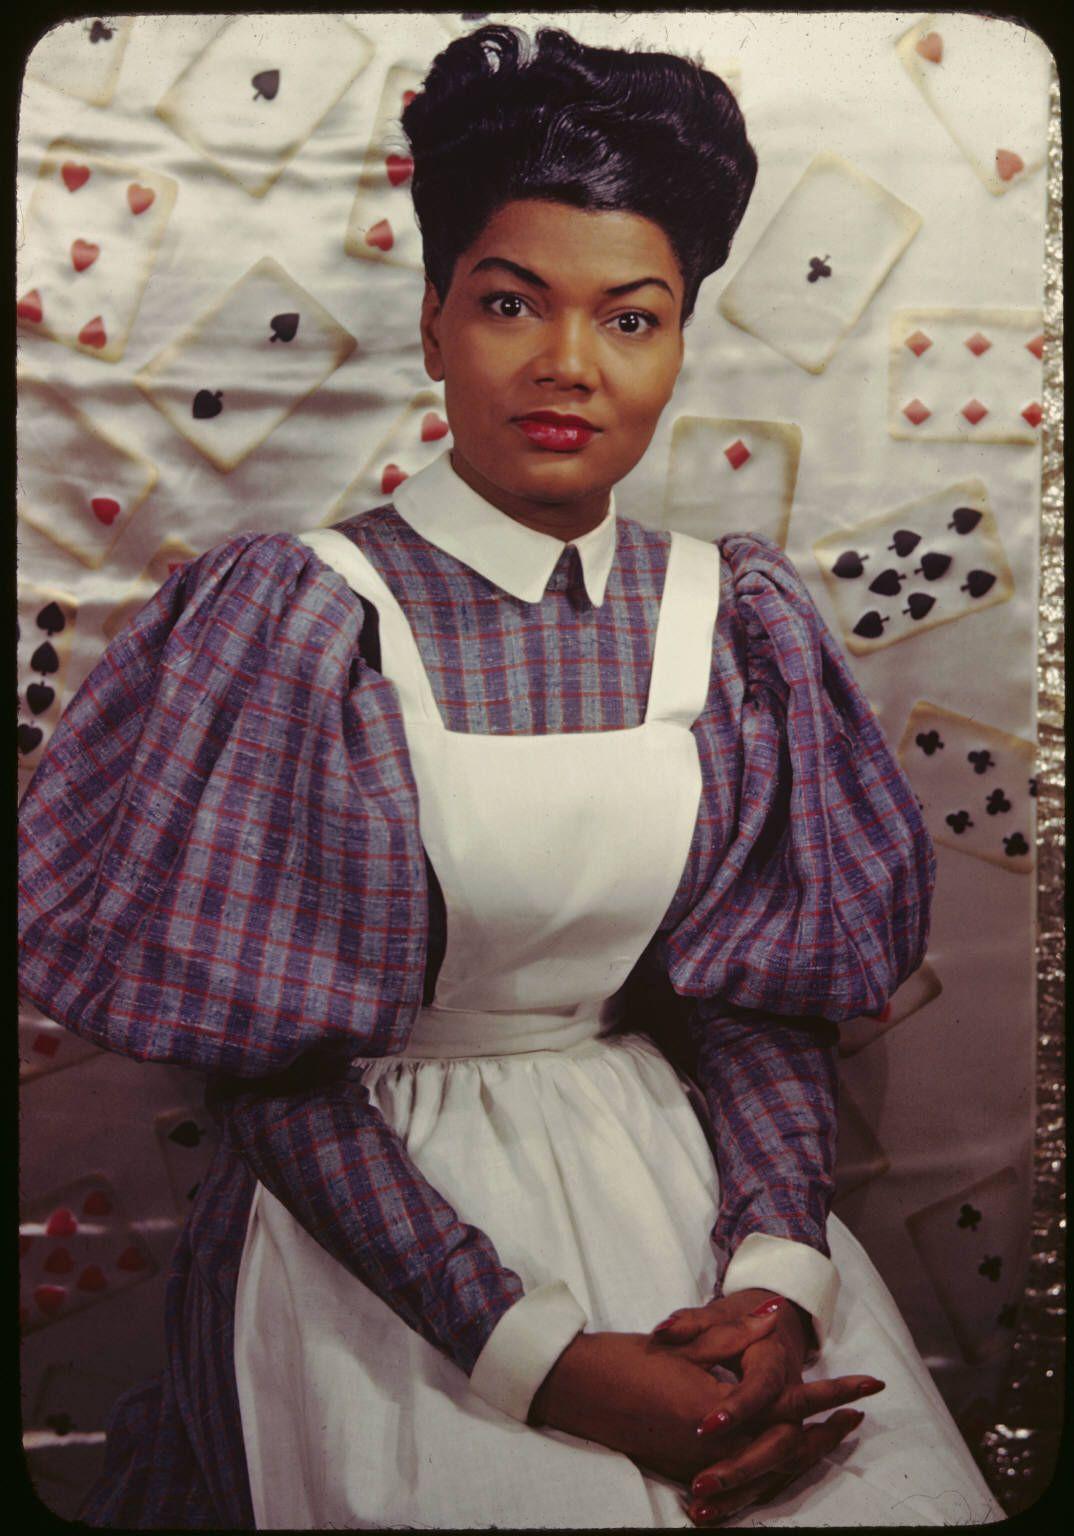 Ethel Ernestine Harper